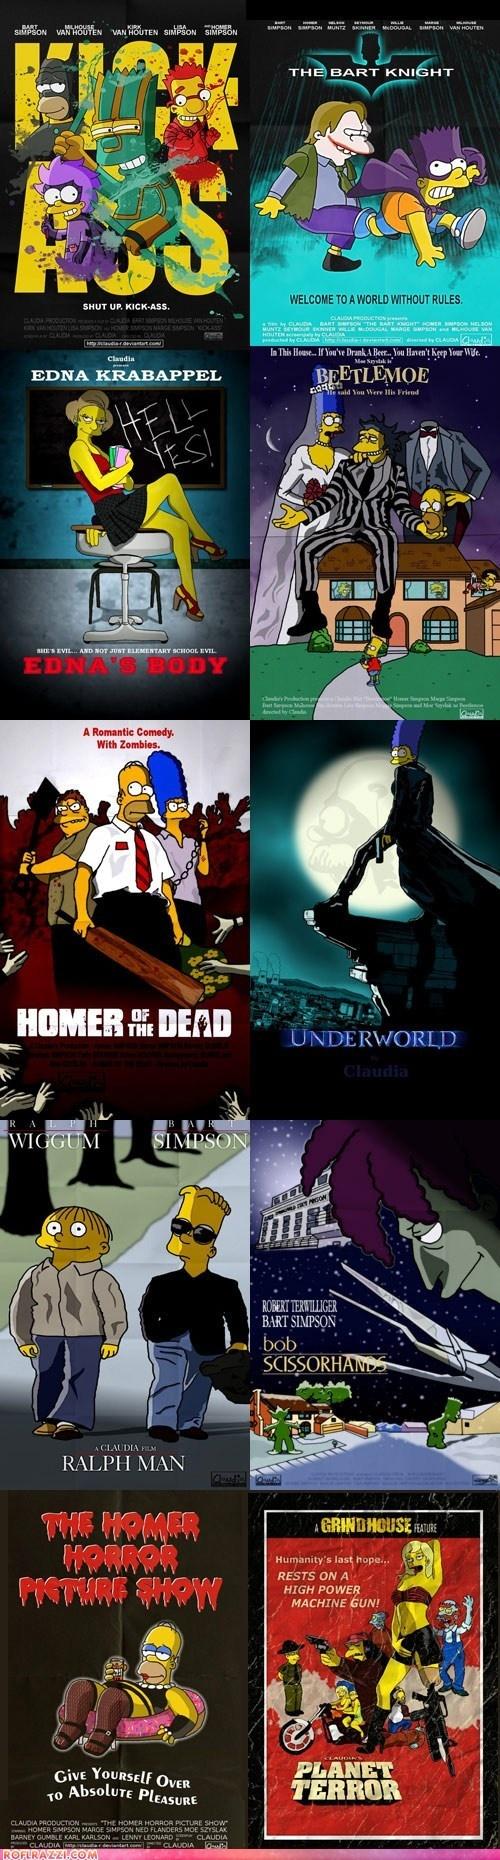 Claudia R.'s Simpsons Movie Poster Parodies. Bonus points for Bartman!